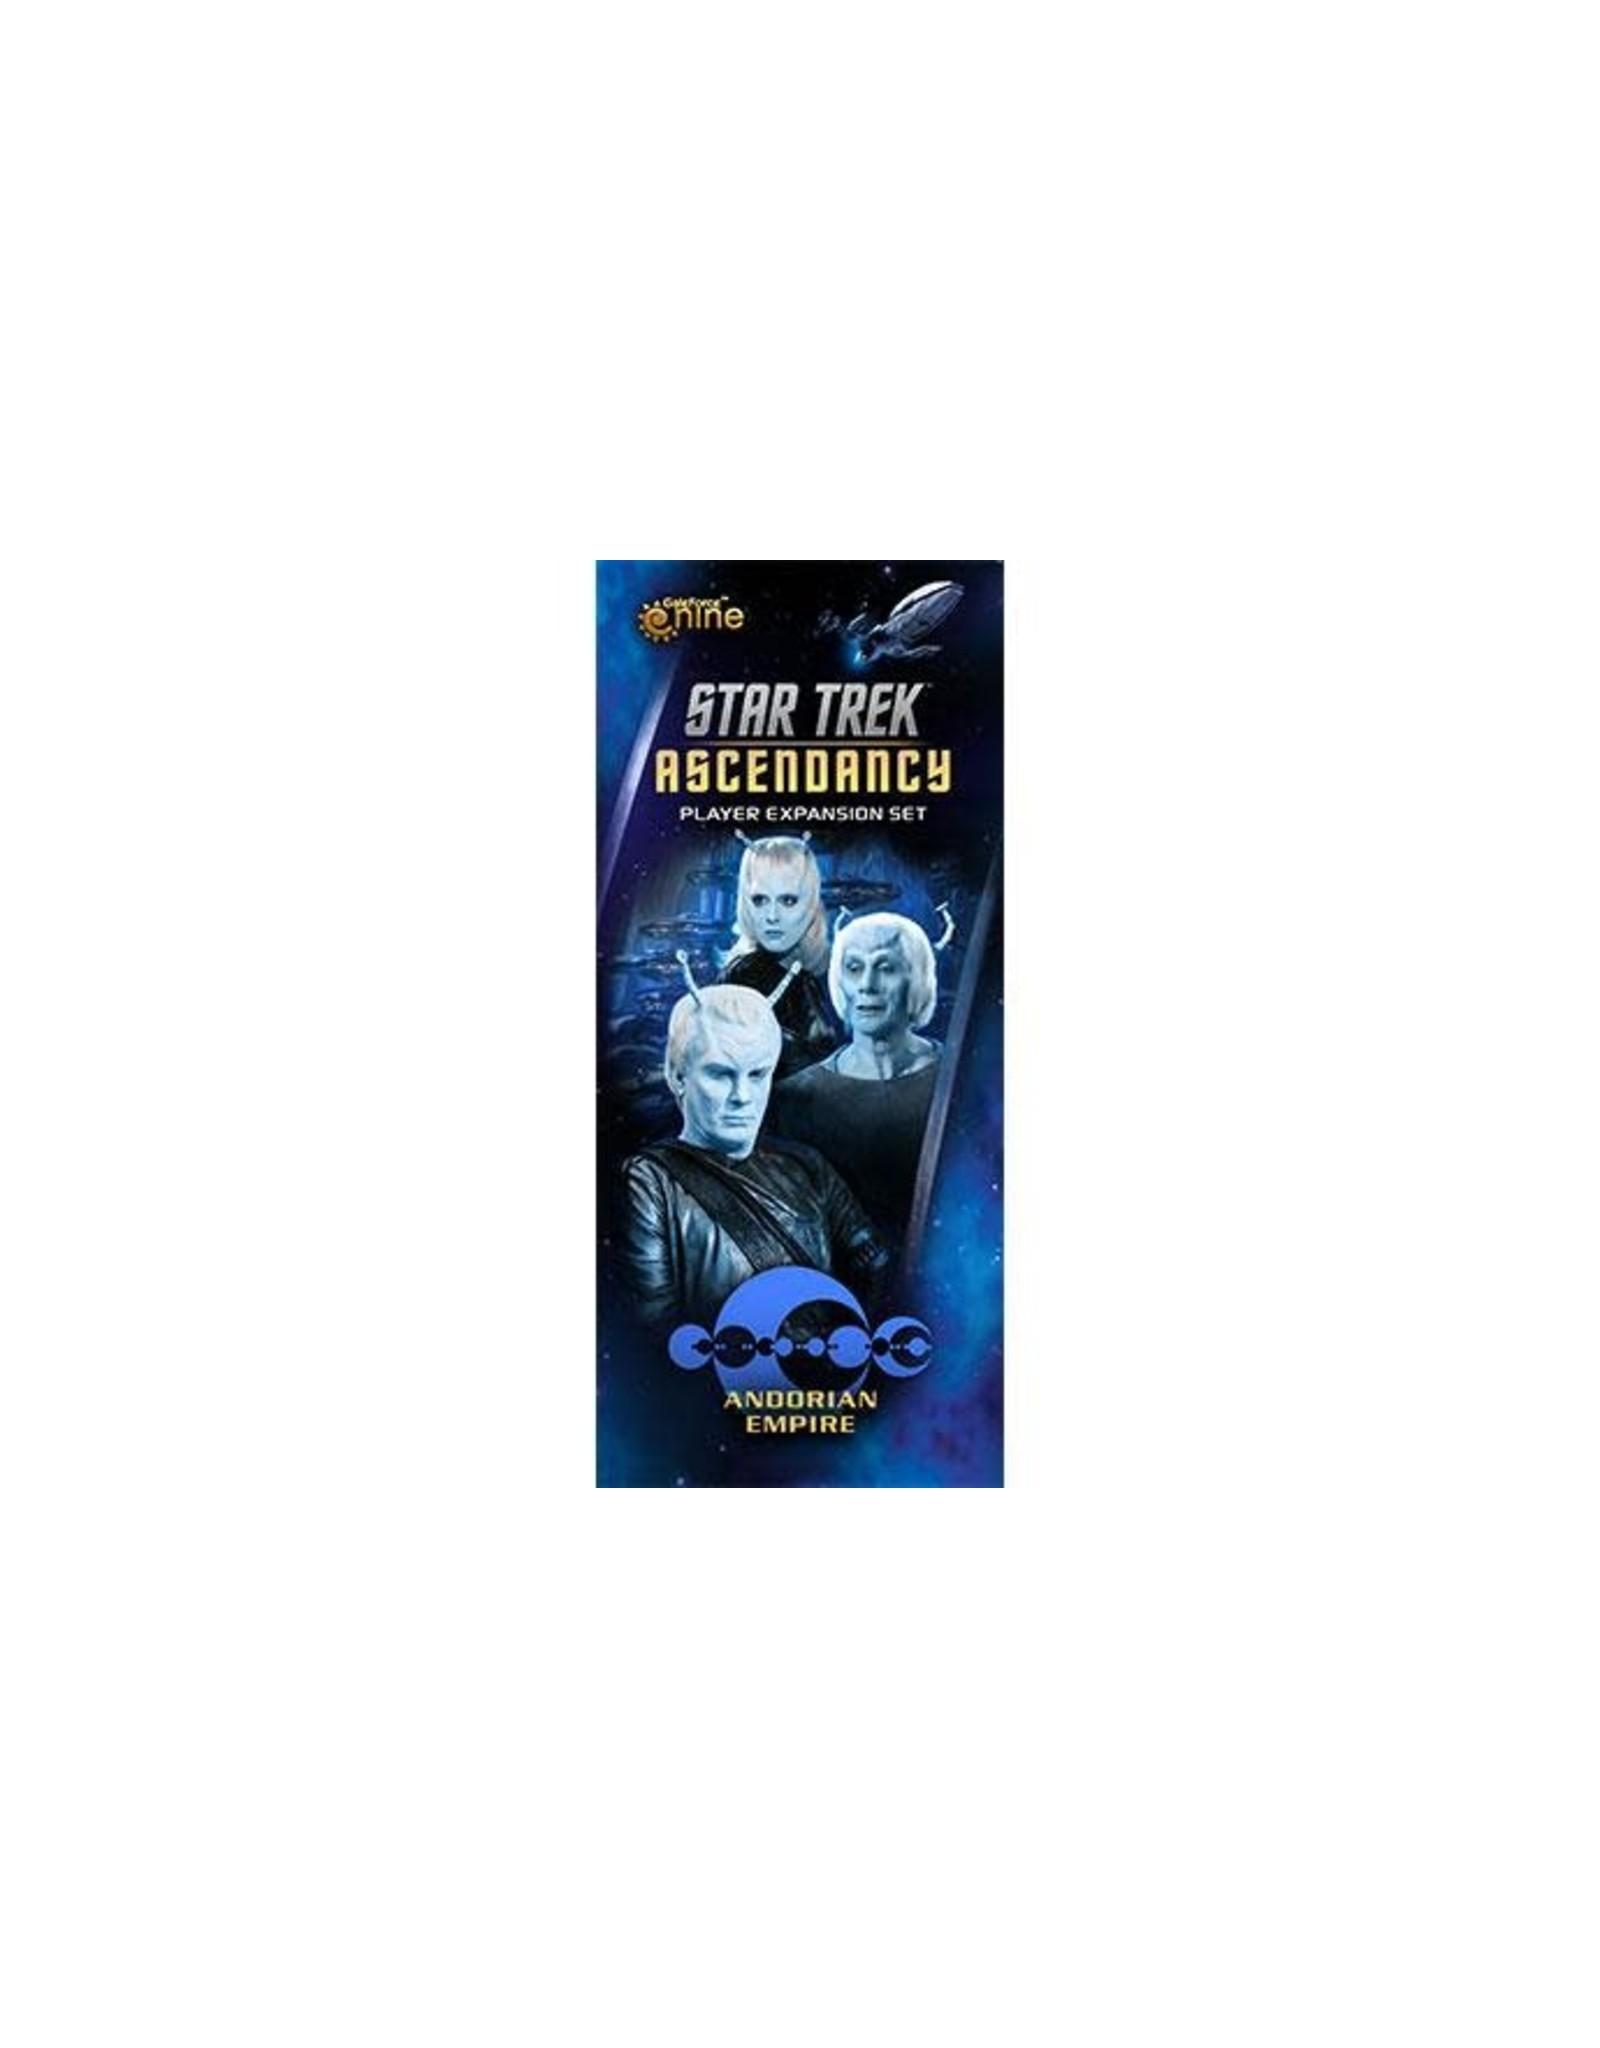 GaleForce nine Star Trek Ascendancy: Andorian Empire Player Expansion Set